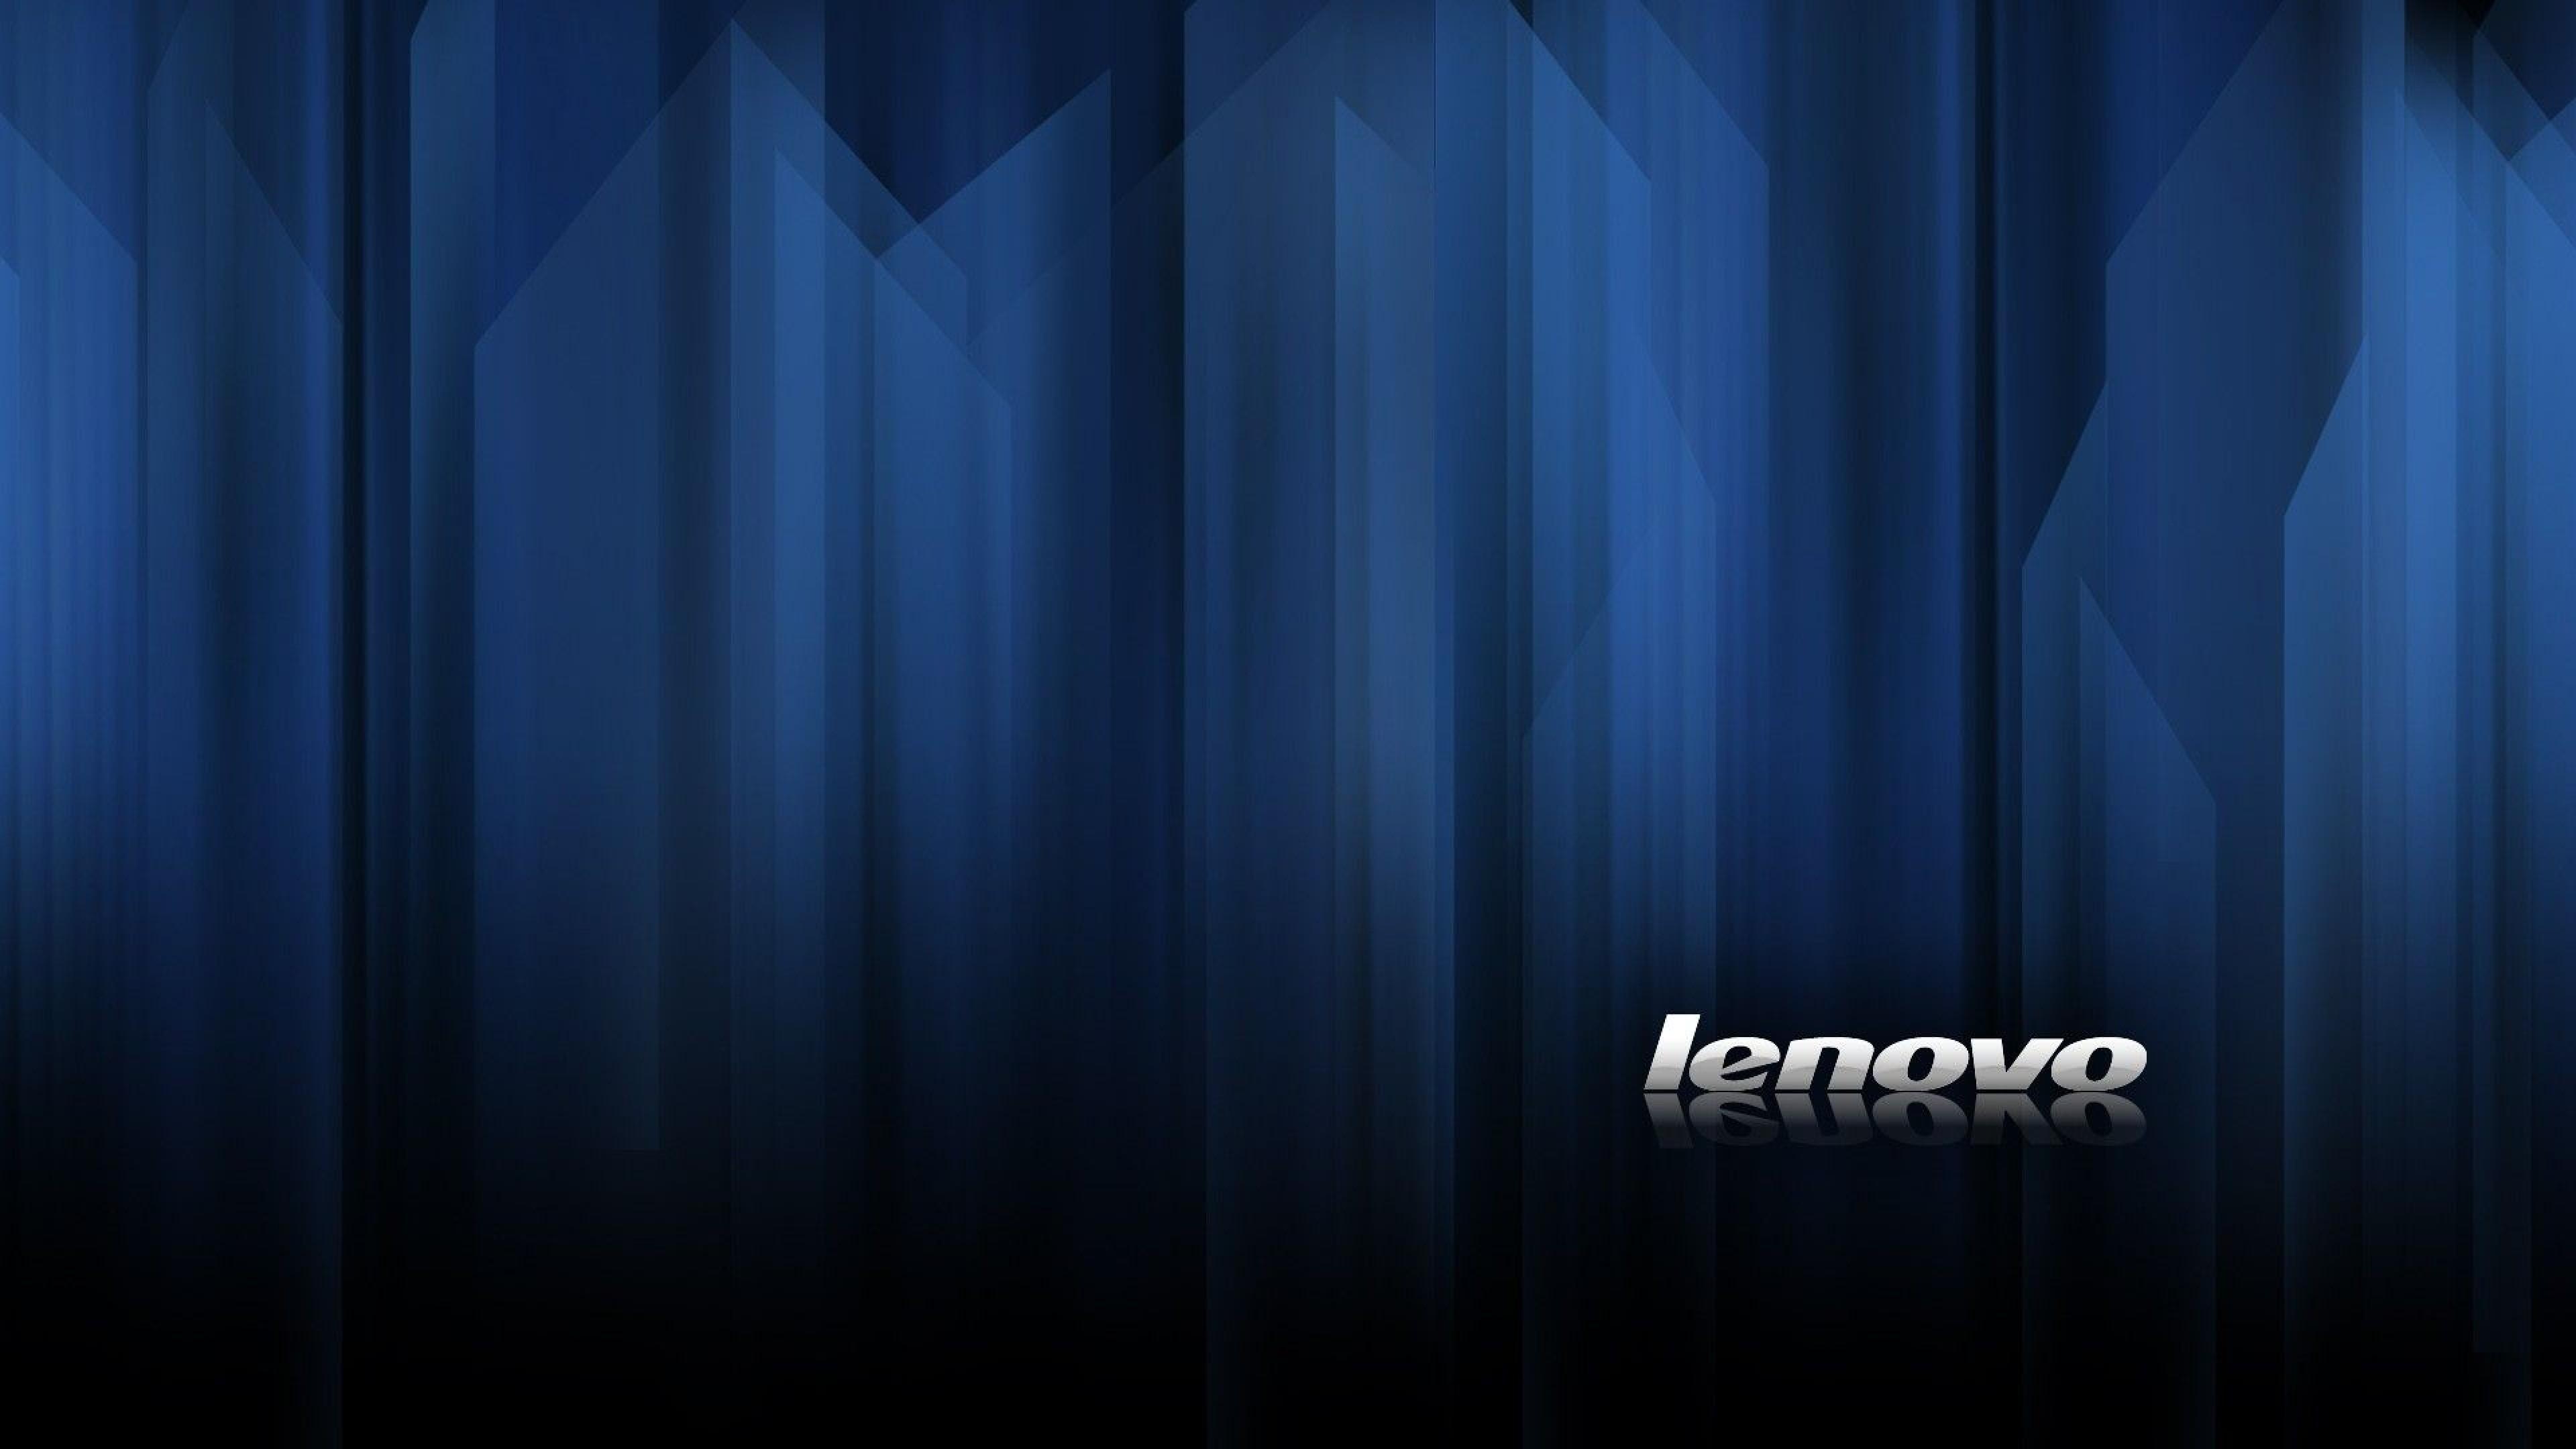 Ultra 4K HD Lenovo Wallpaper 45 images 3840x2160